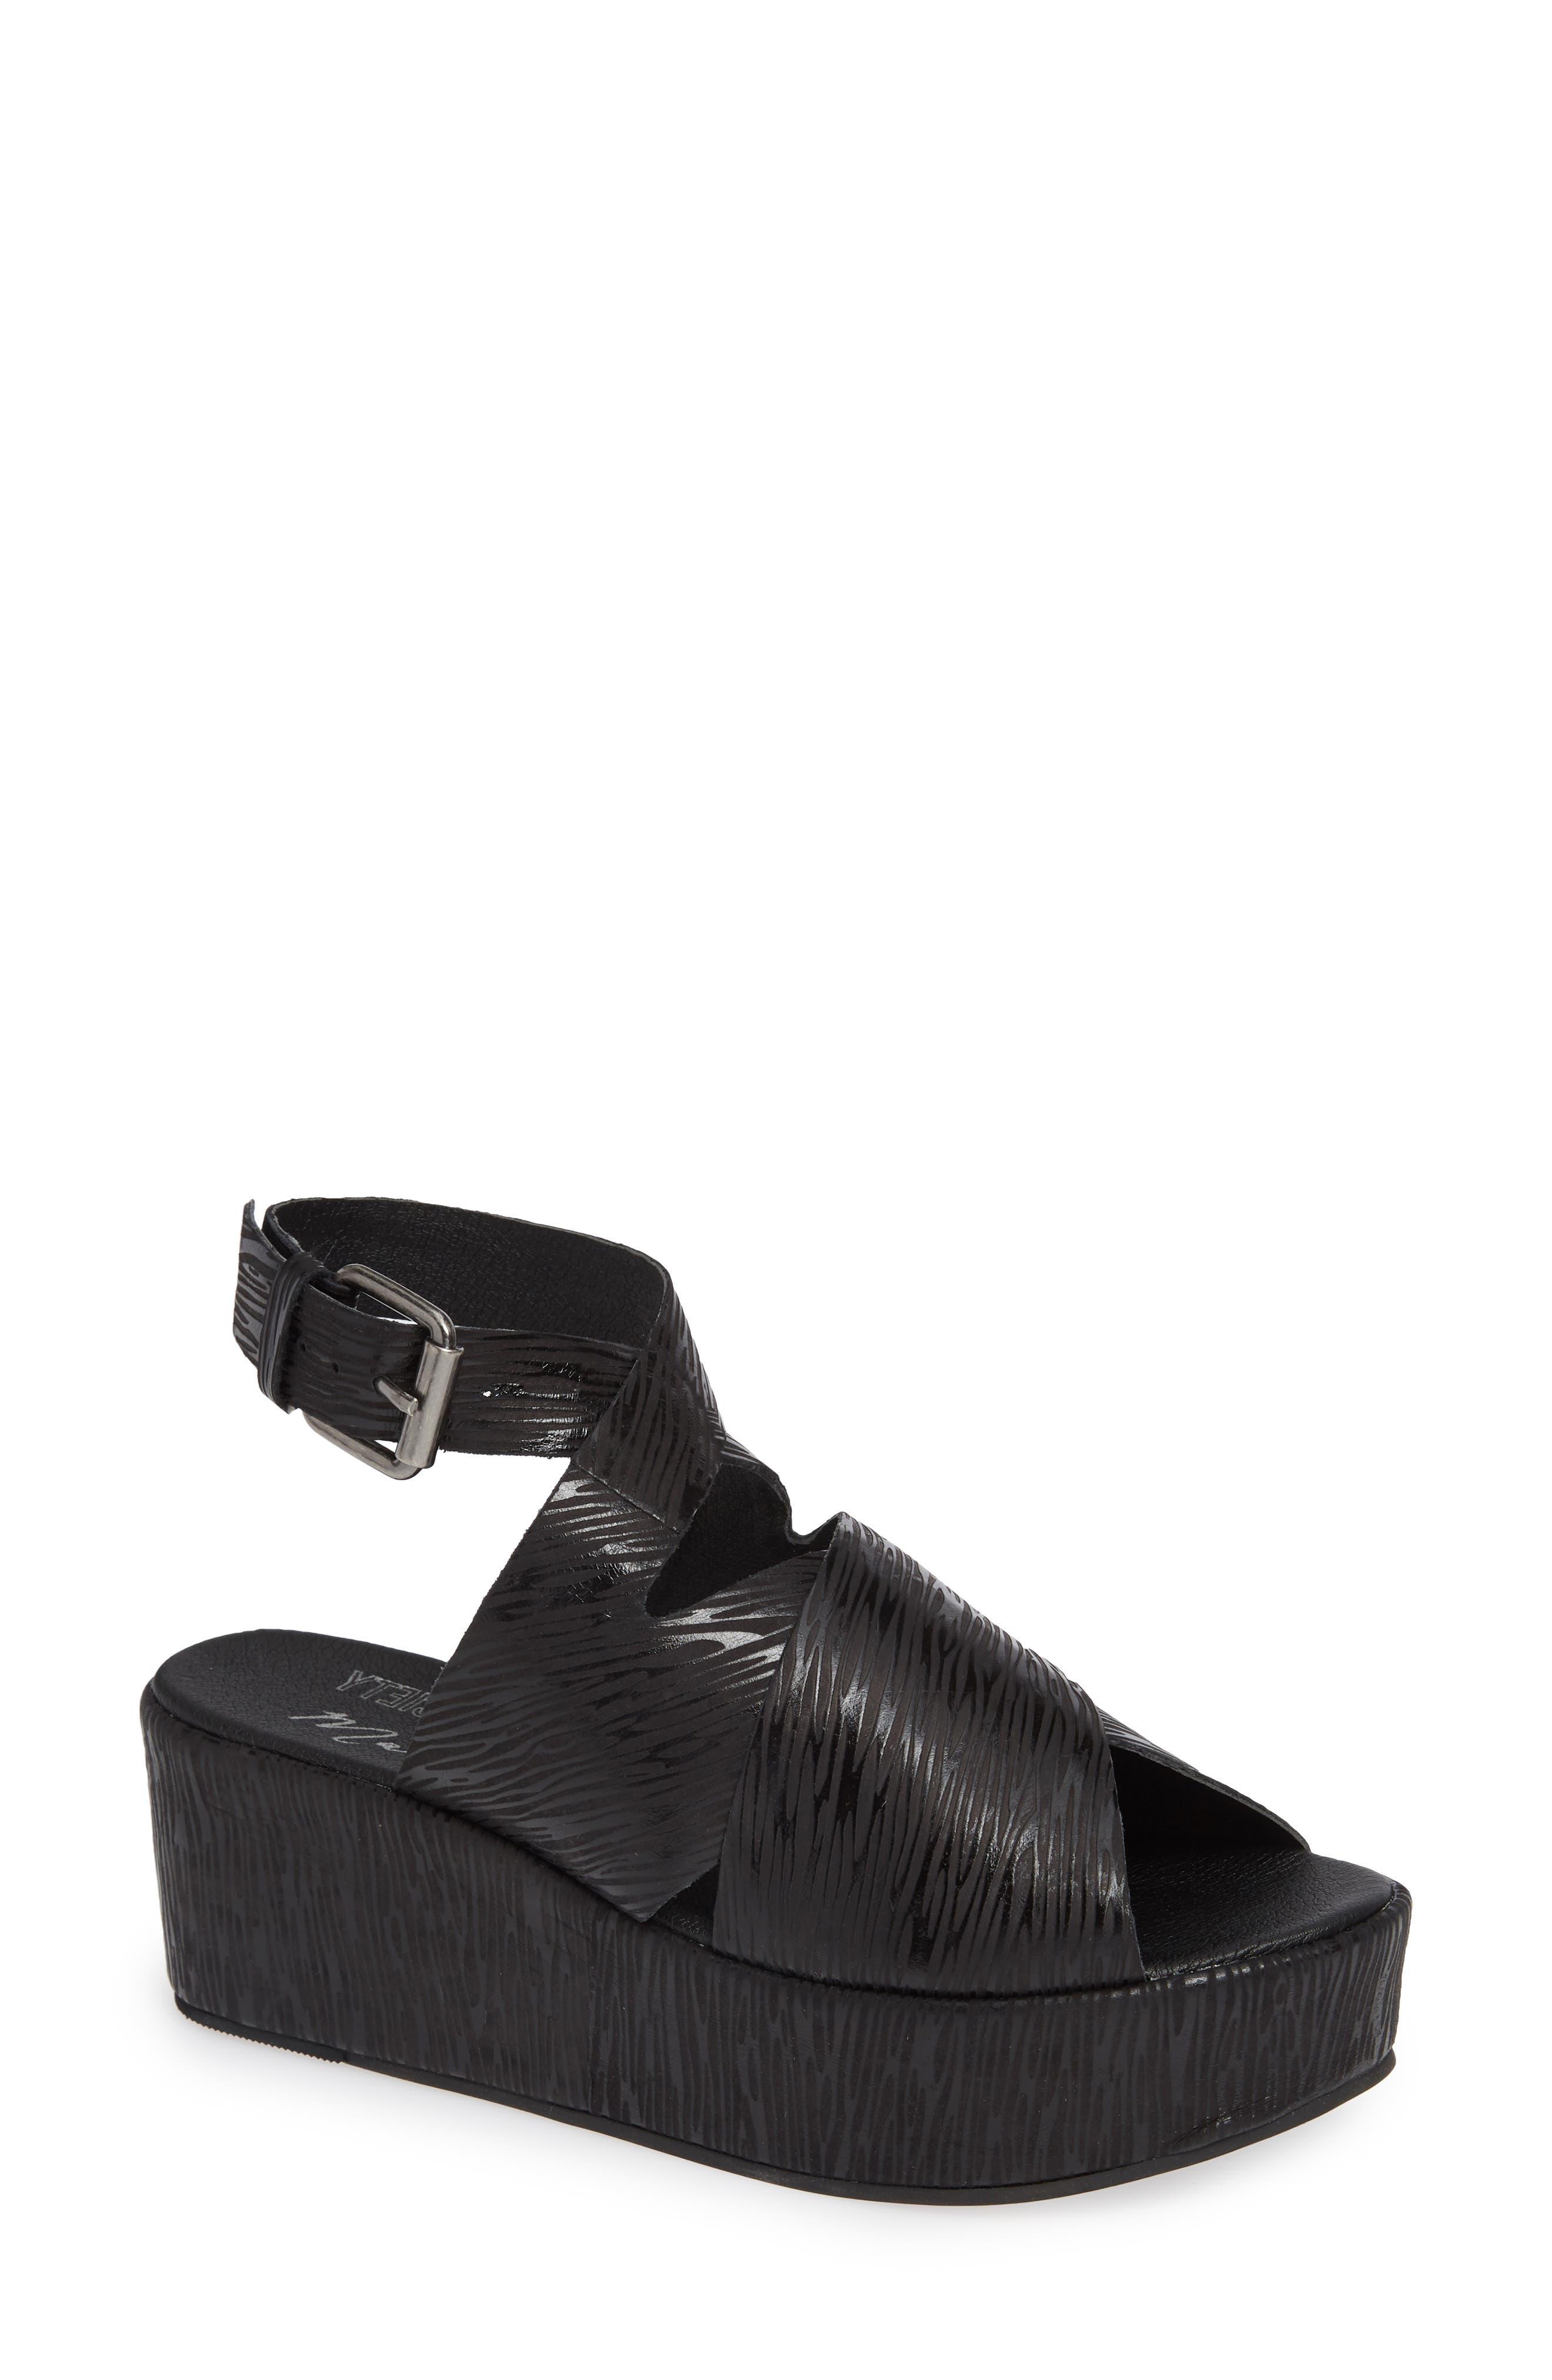 Runaway Wedge Sandal, Main, color, BLACK LIZARD PRINT LEATHER